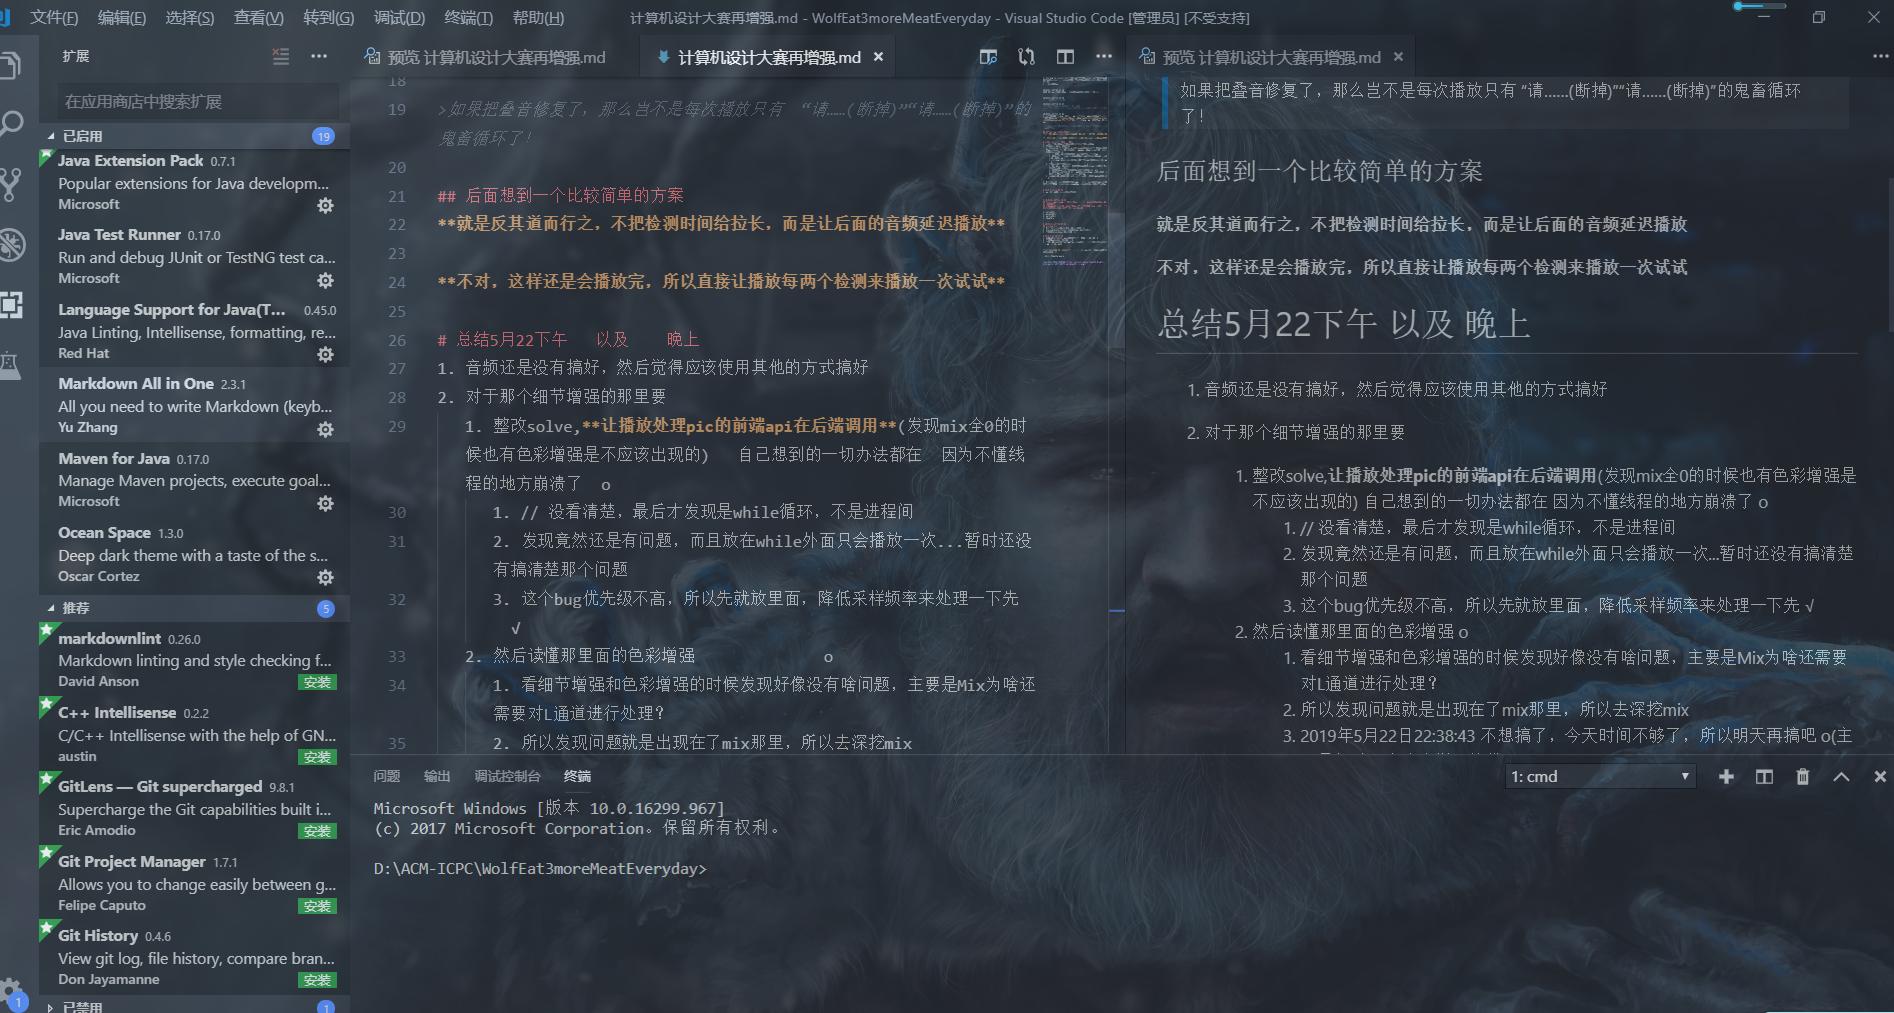 VScode的markdown展示